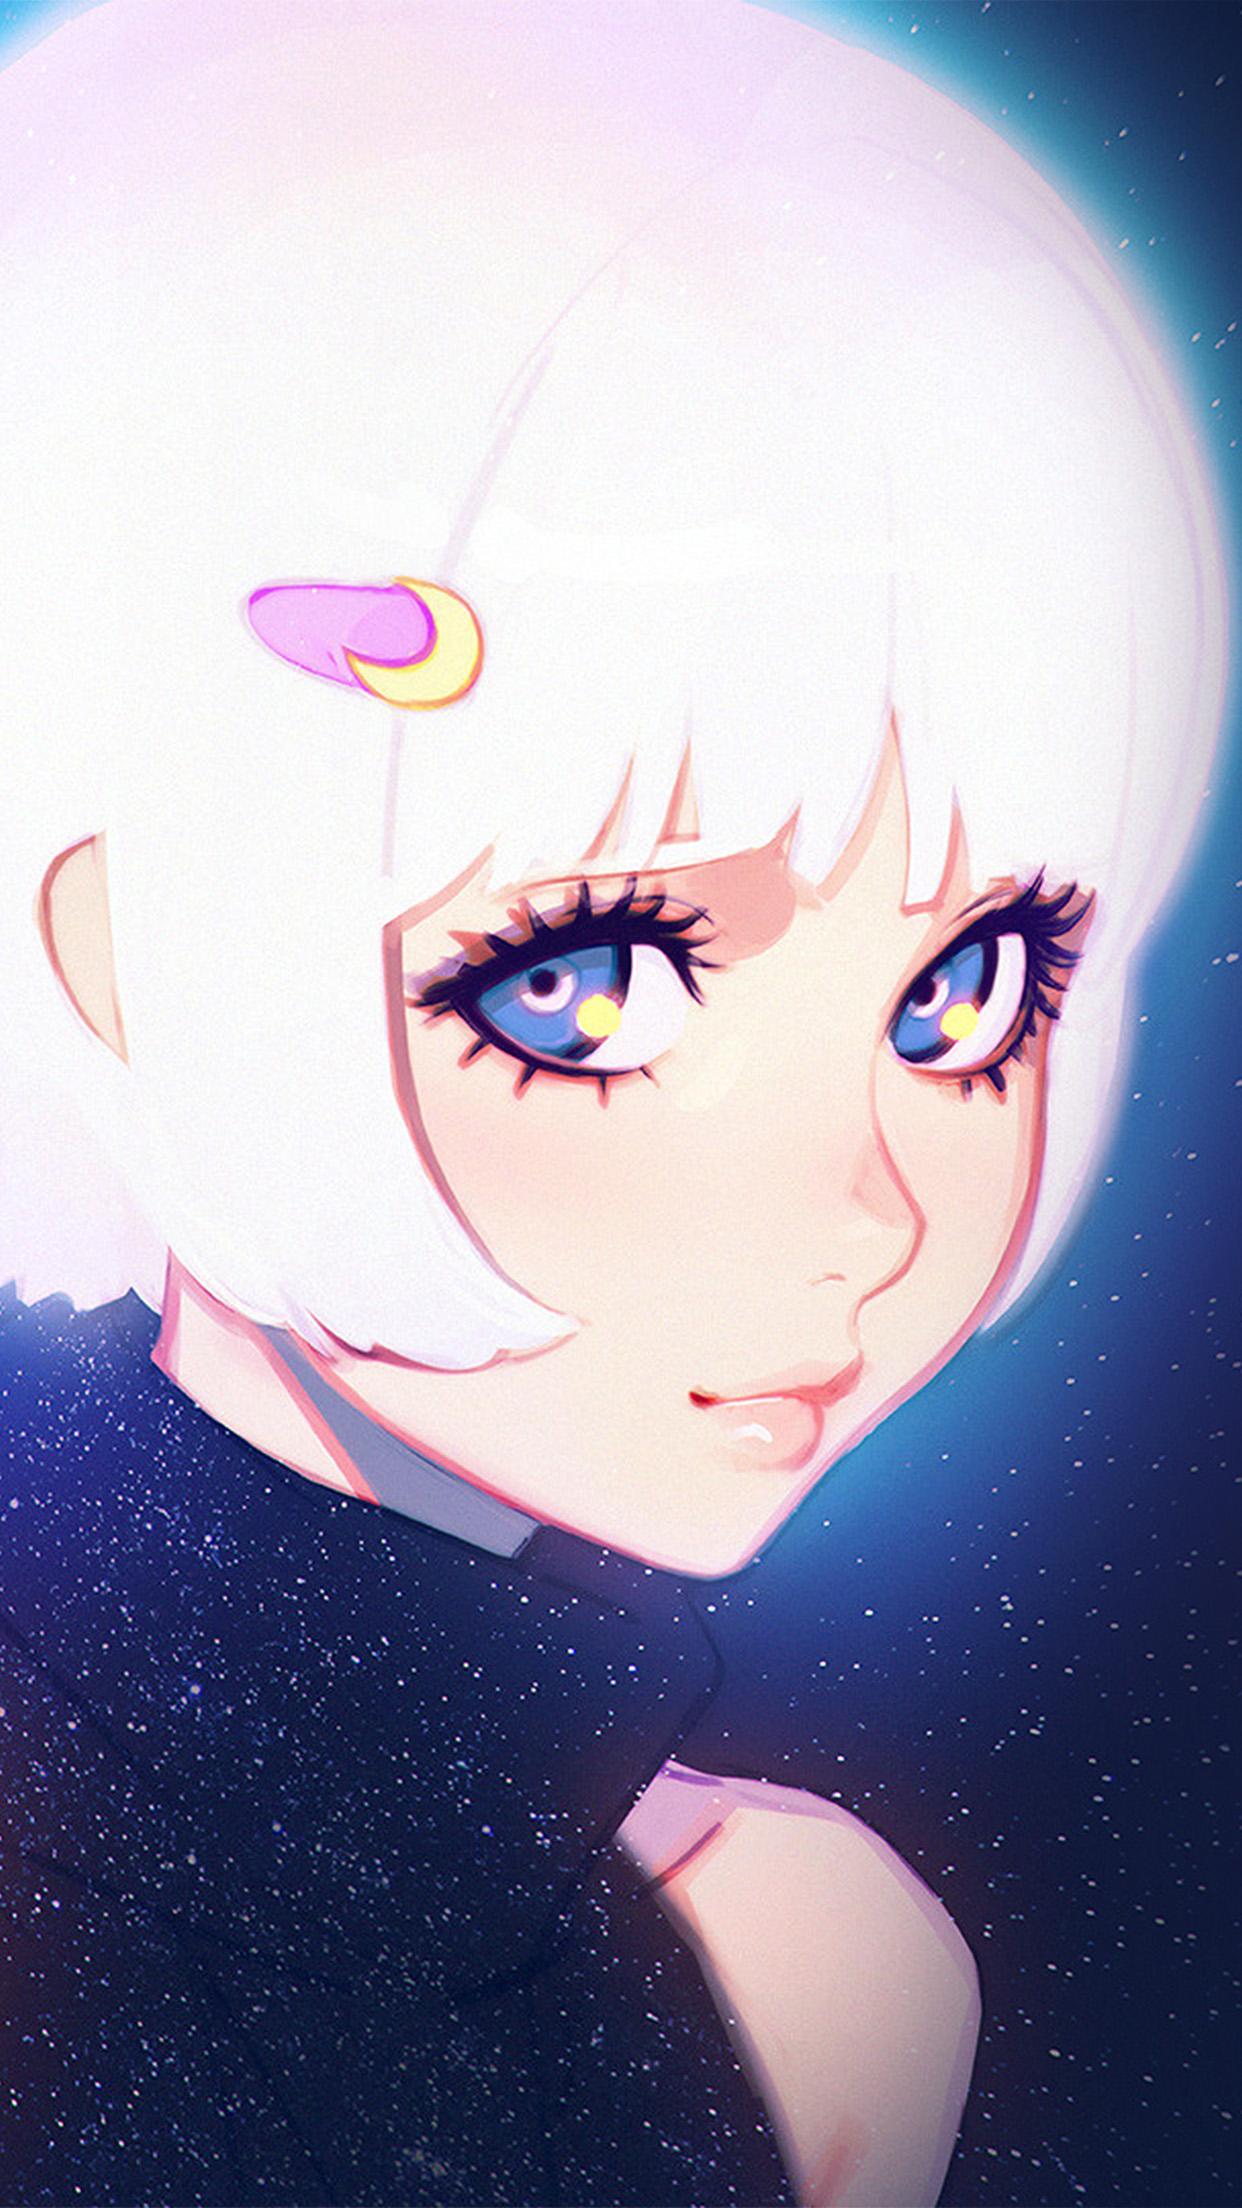 Cute Small Girl Wallpaper Ax55 Ilya Kuvshinov Illustration Art Girl Dark White Hair